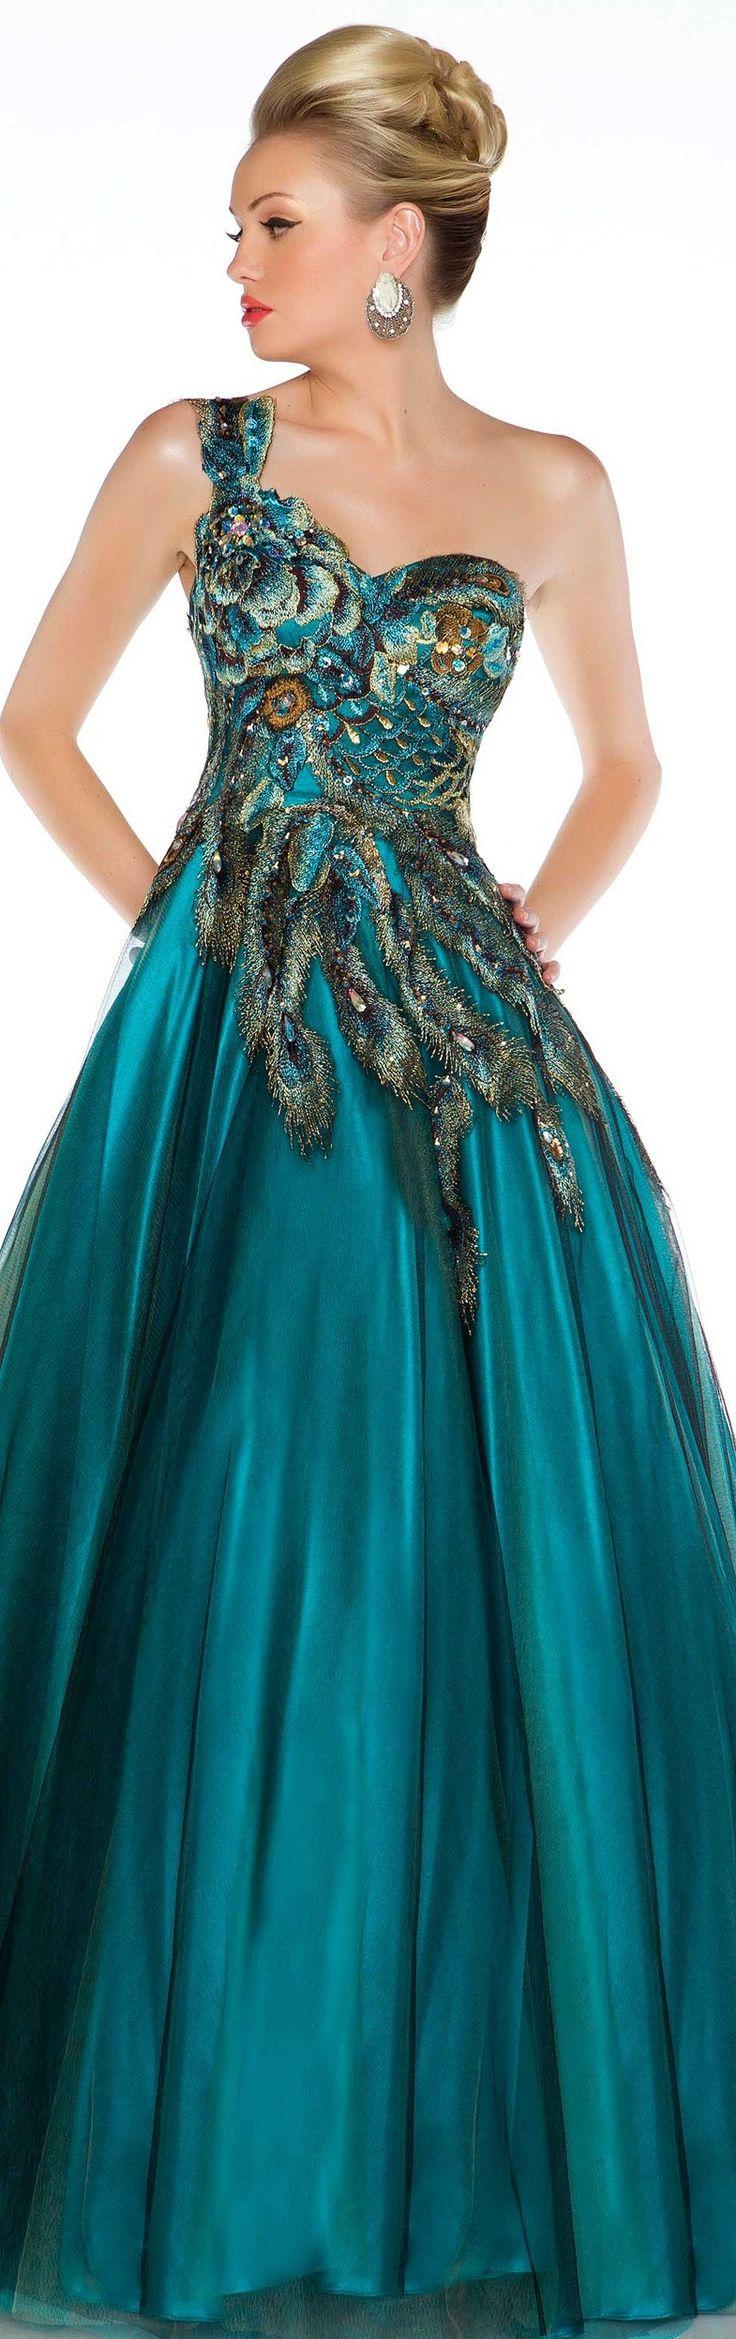 Mac Duggal couture 2013 ~  ♥ Golden Velvet FABULOUS ♛